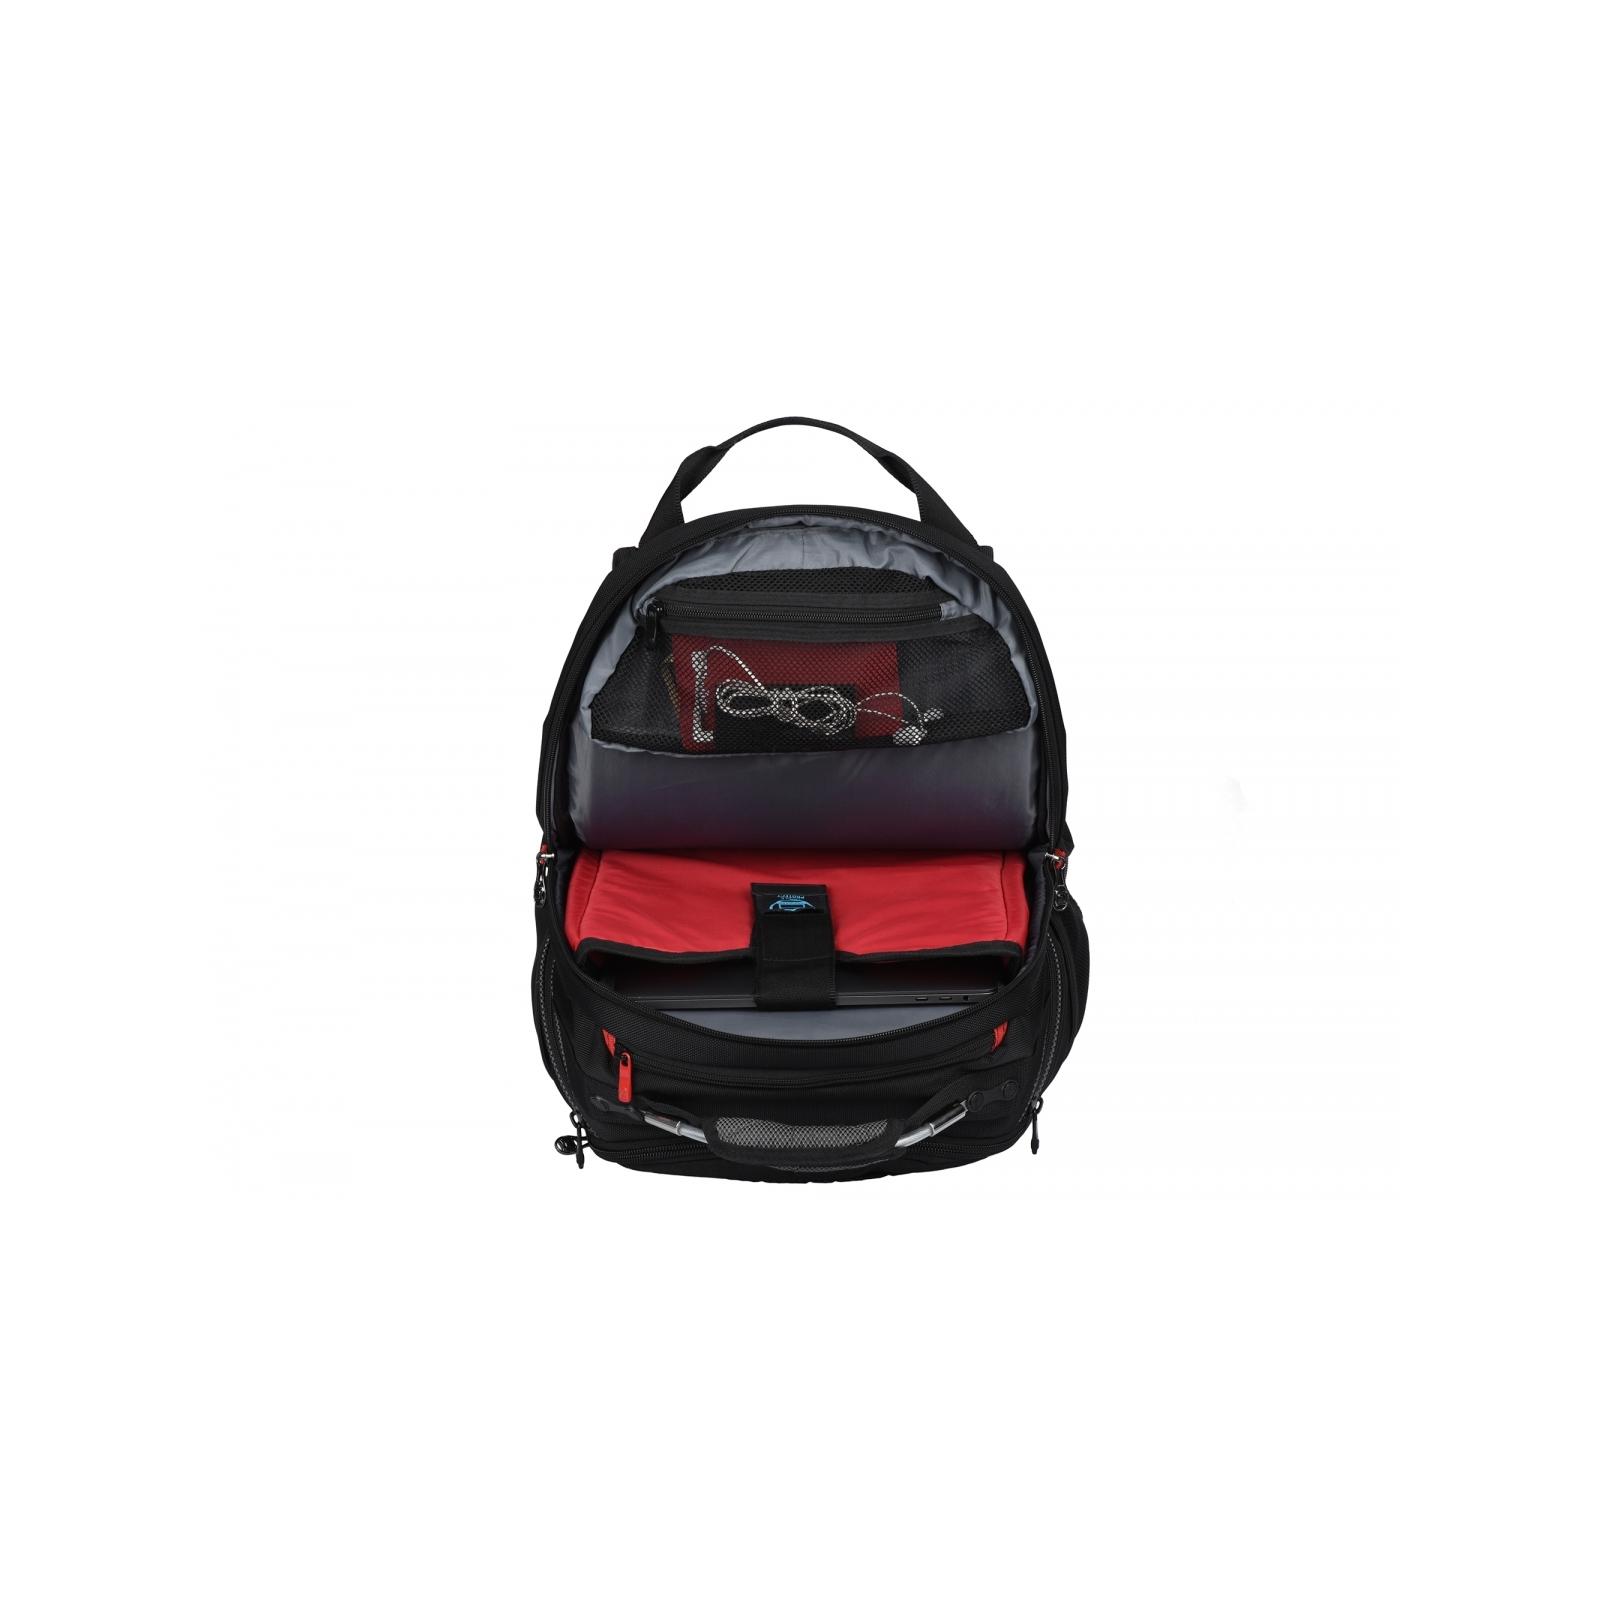 "Рюкзак для ноутбука Wenger 16"" Synergy Black/Gray (600635) изображение 9"